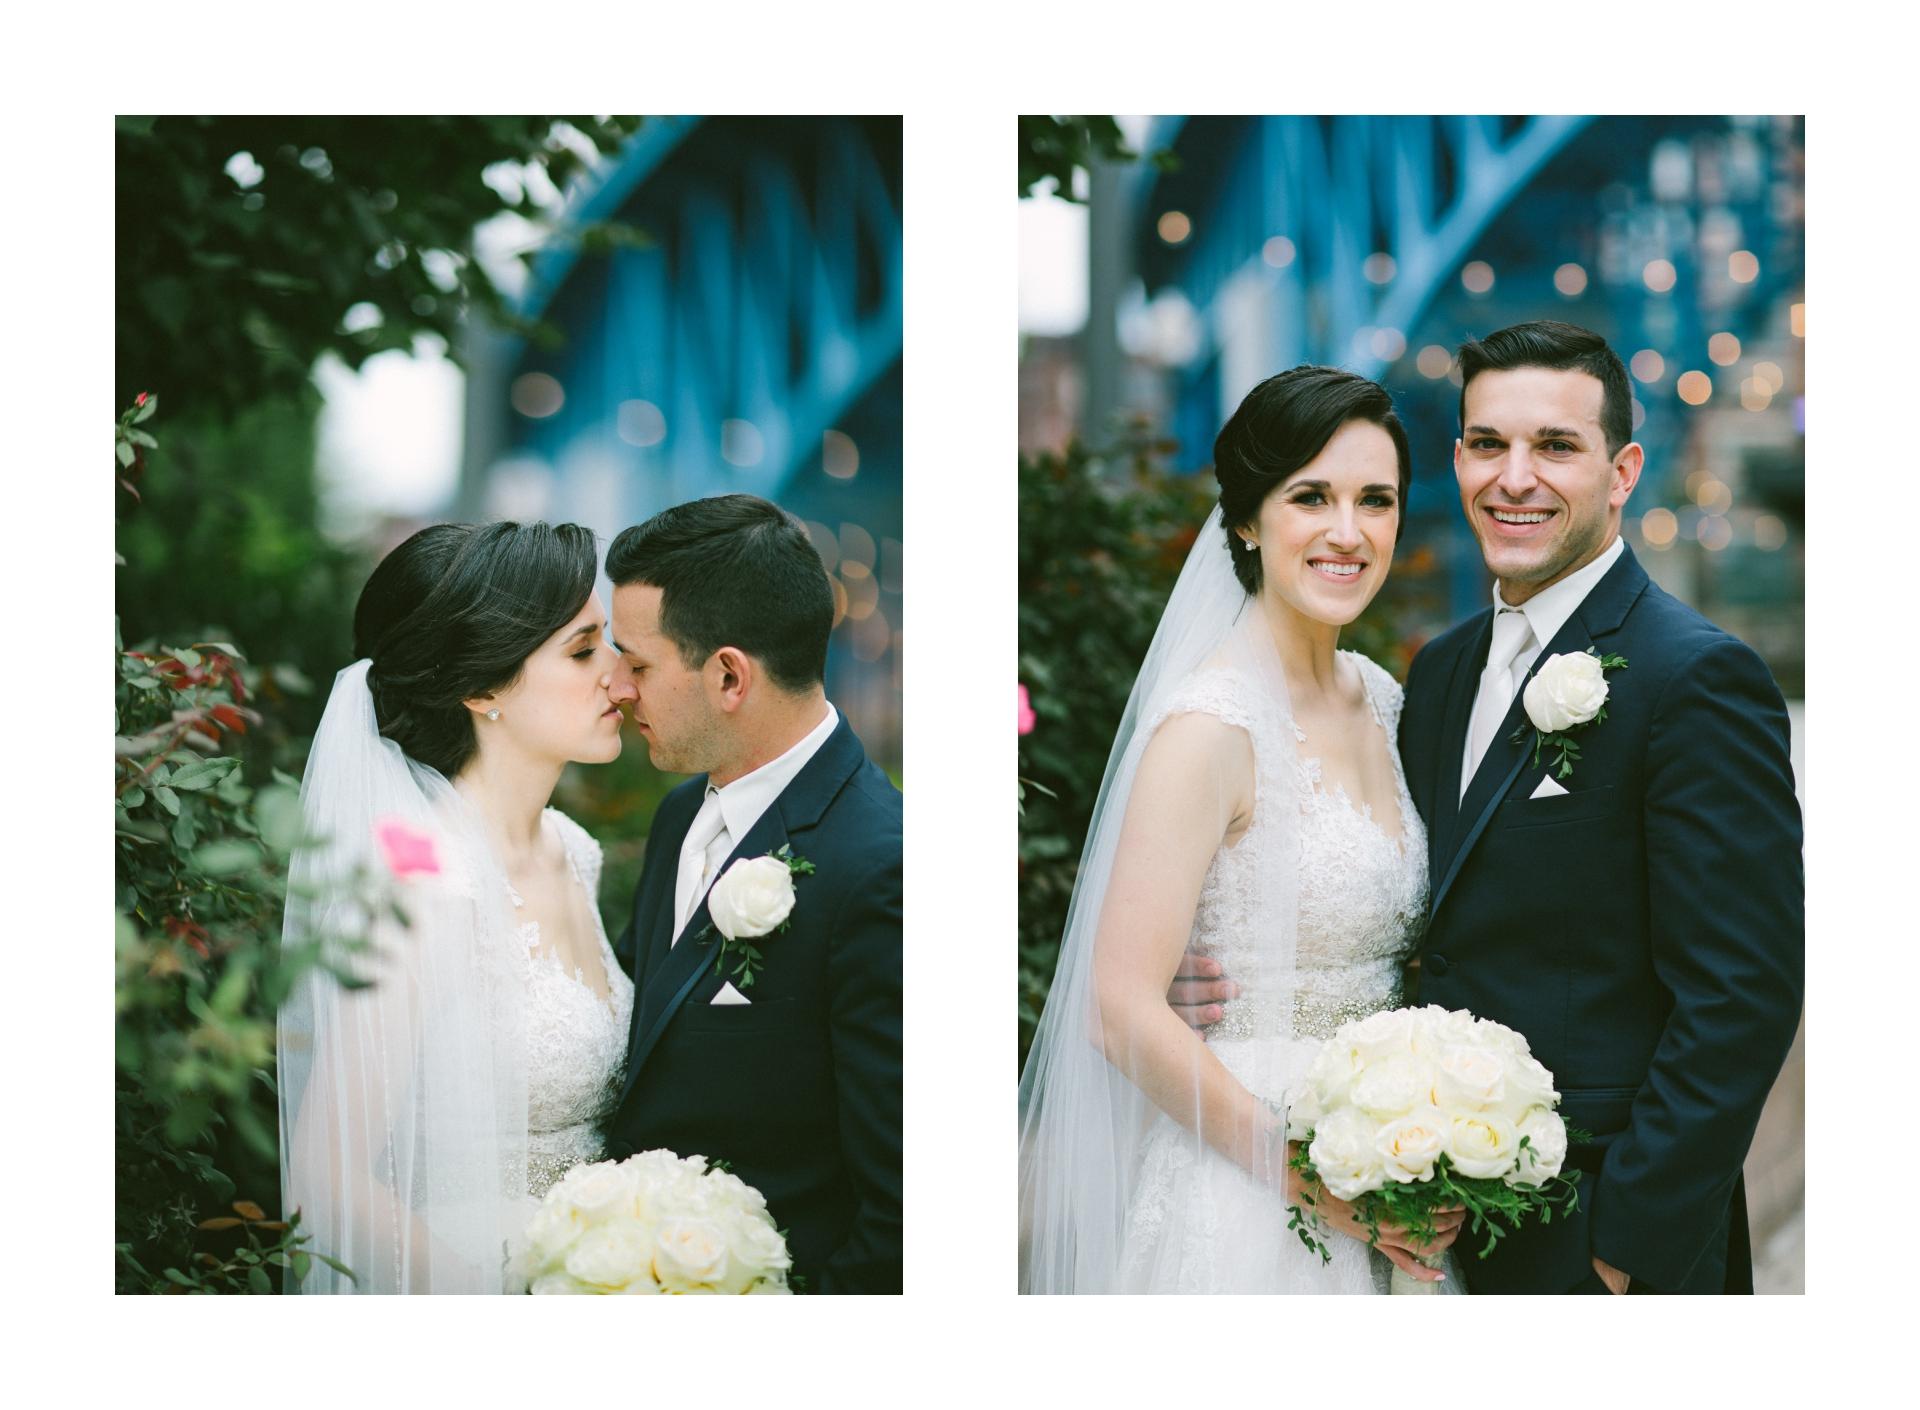 Intercontinental Hotel Wedding in Cleveland 2 25.jpg